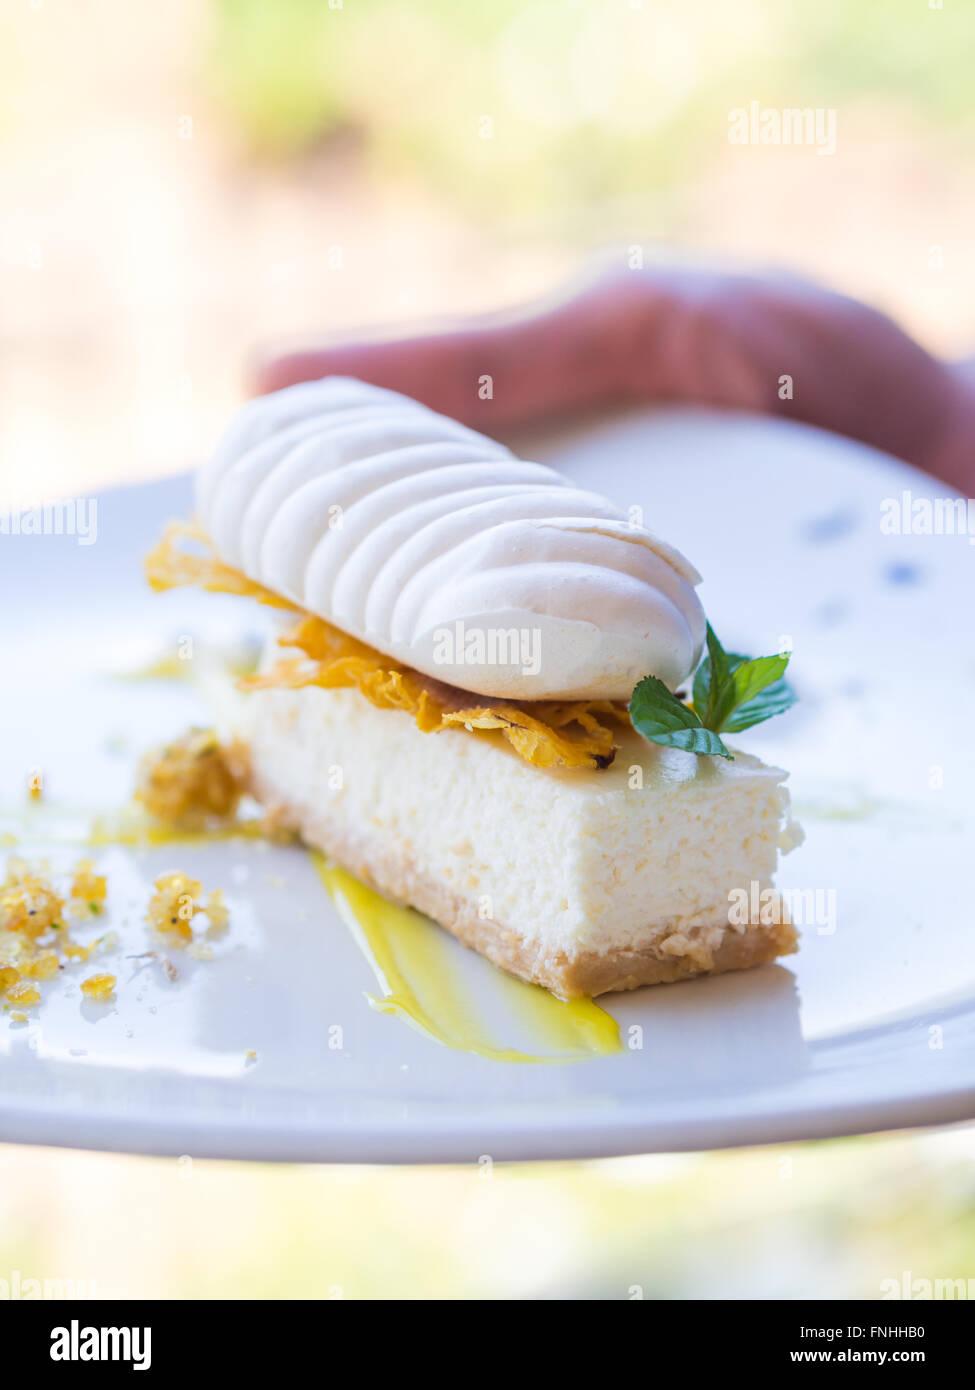 Pineapple fridge cheesecake. - Stock Image